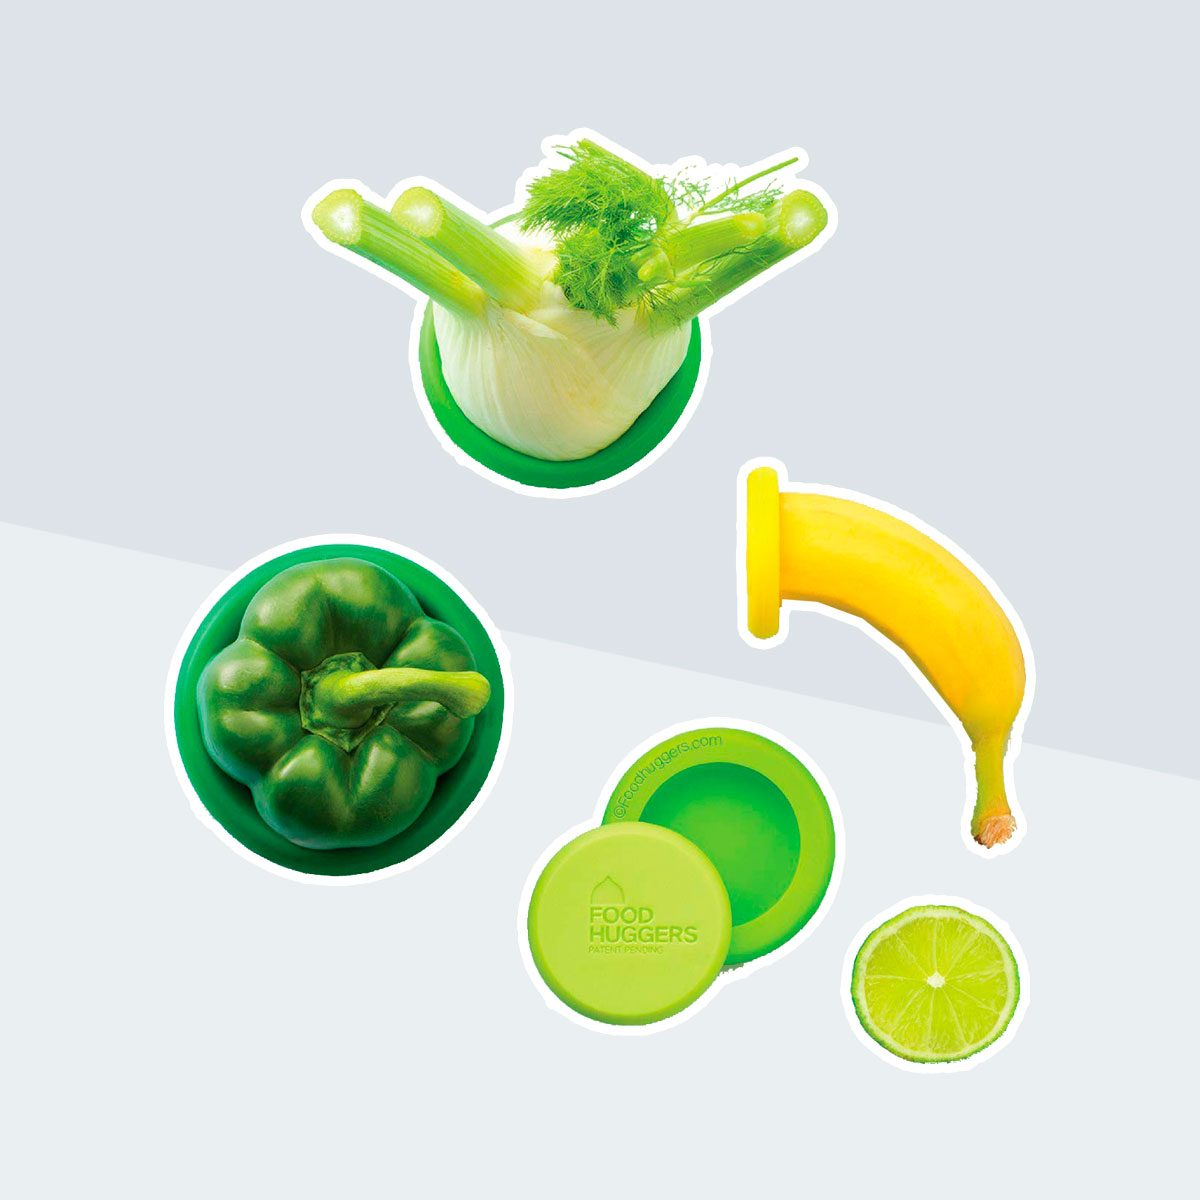 Silicone Food Huggers